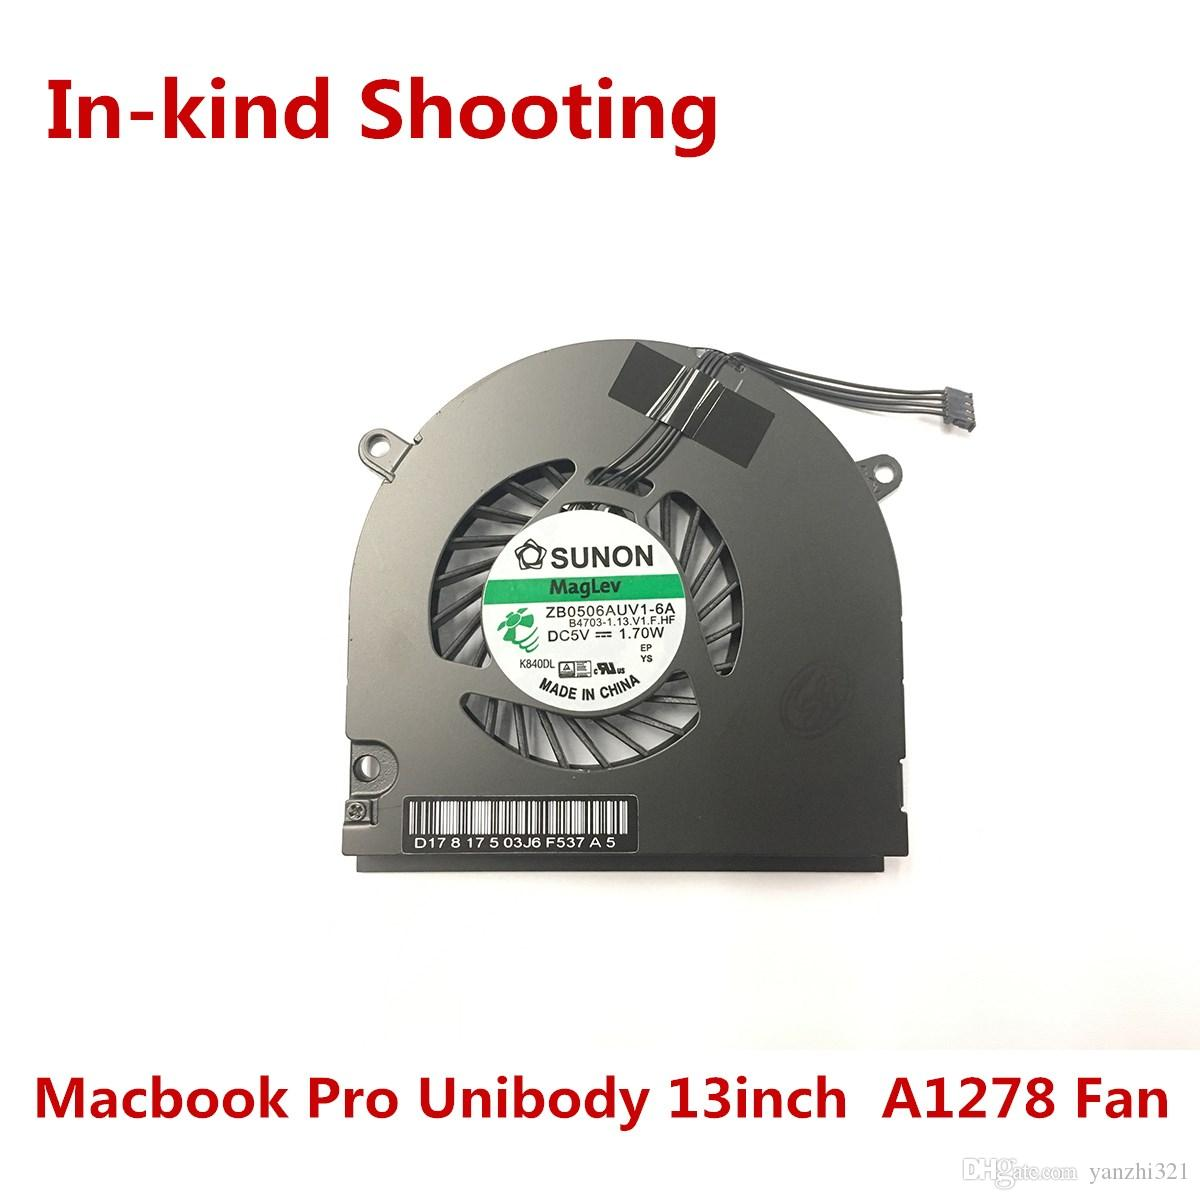 Original NEW A1342 A1278 Fan for Macbook Pro Unibody 13inch 2009-2012year CPU Cooler Fan MB466 MB470 MC375 MB990 MB991 MC700 ZB0506AUV1-6A